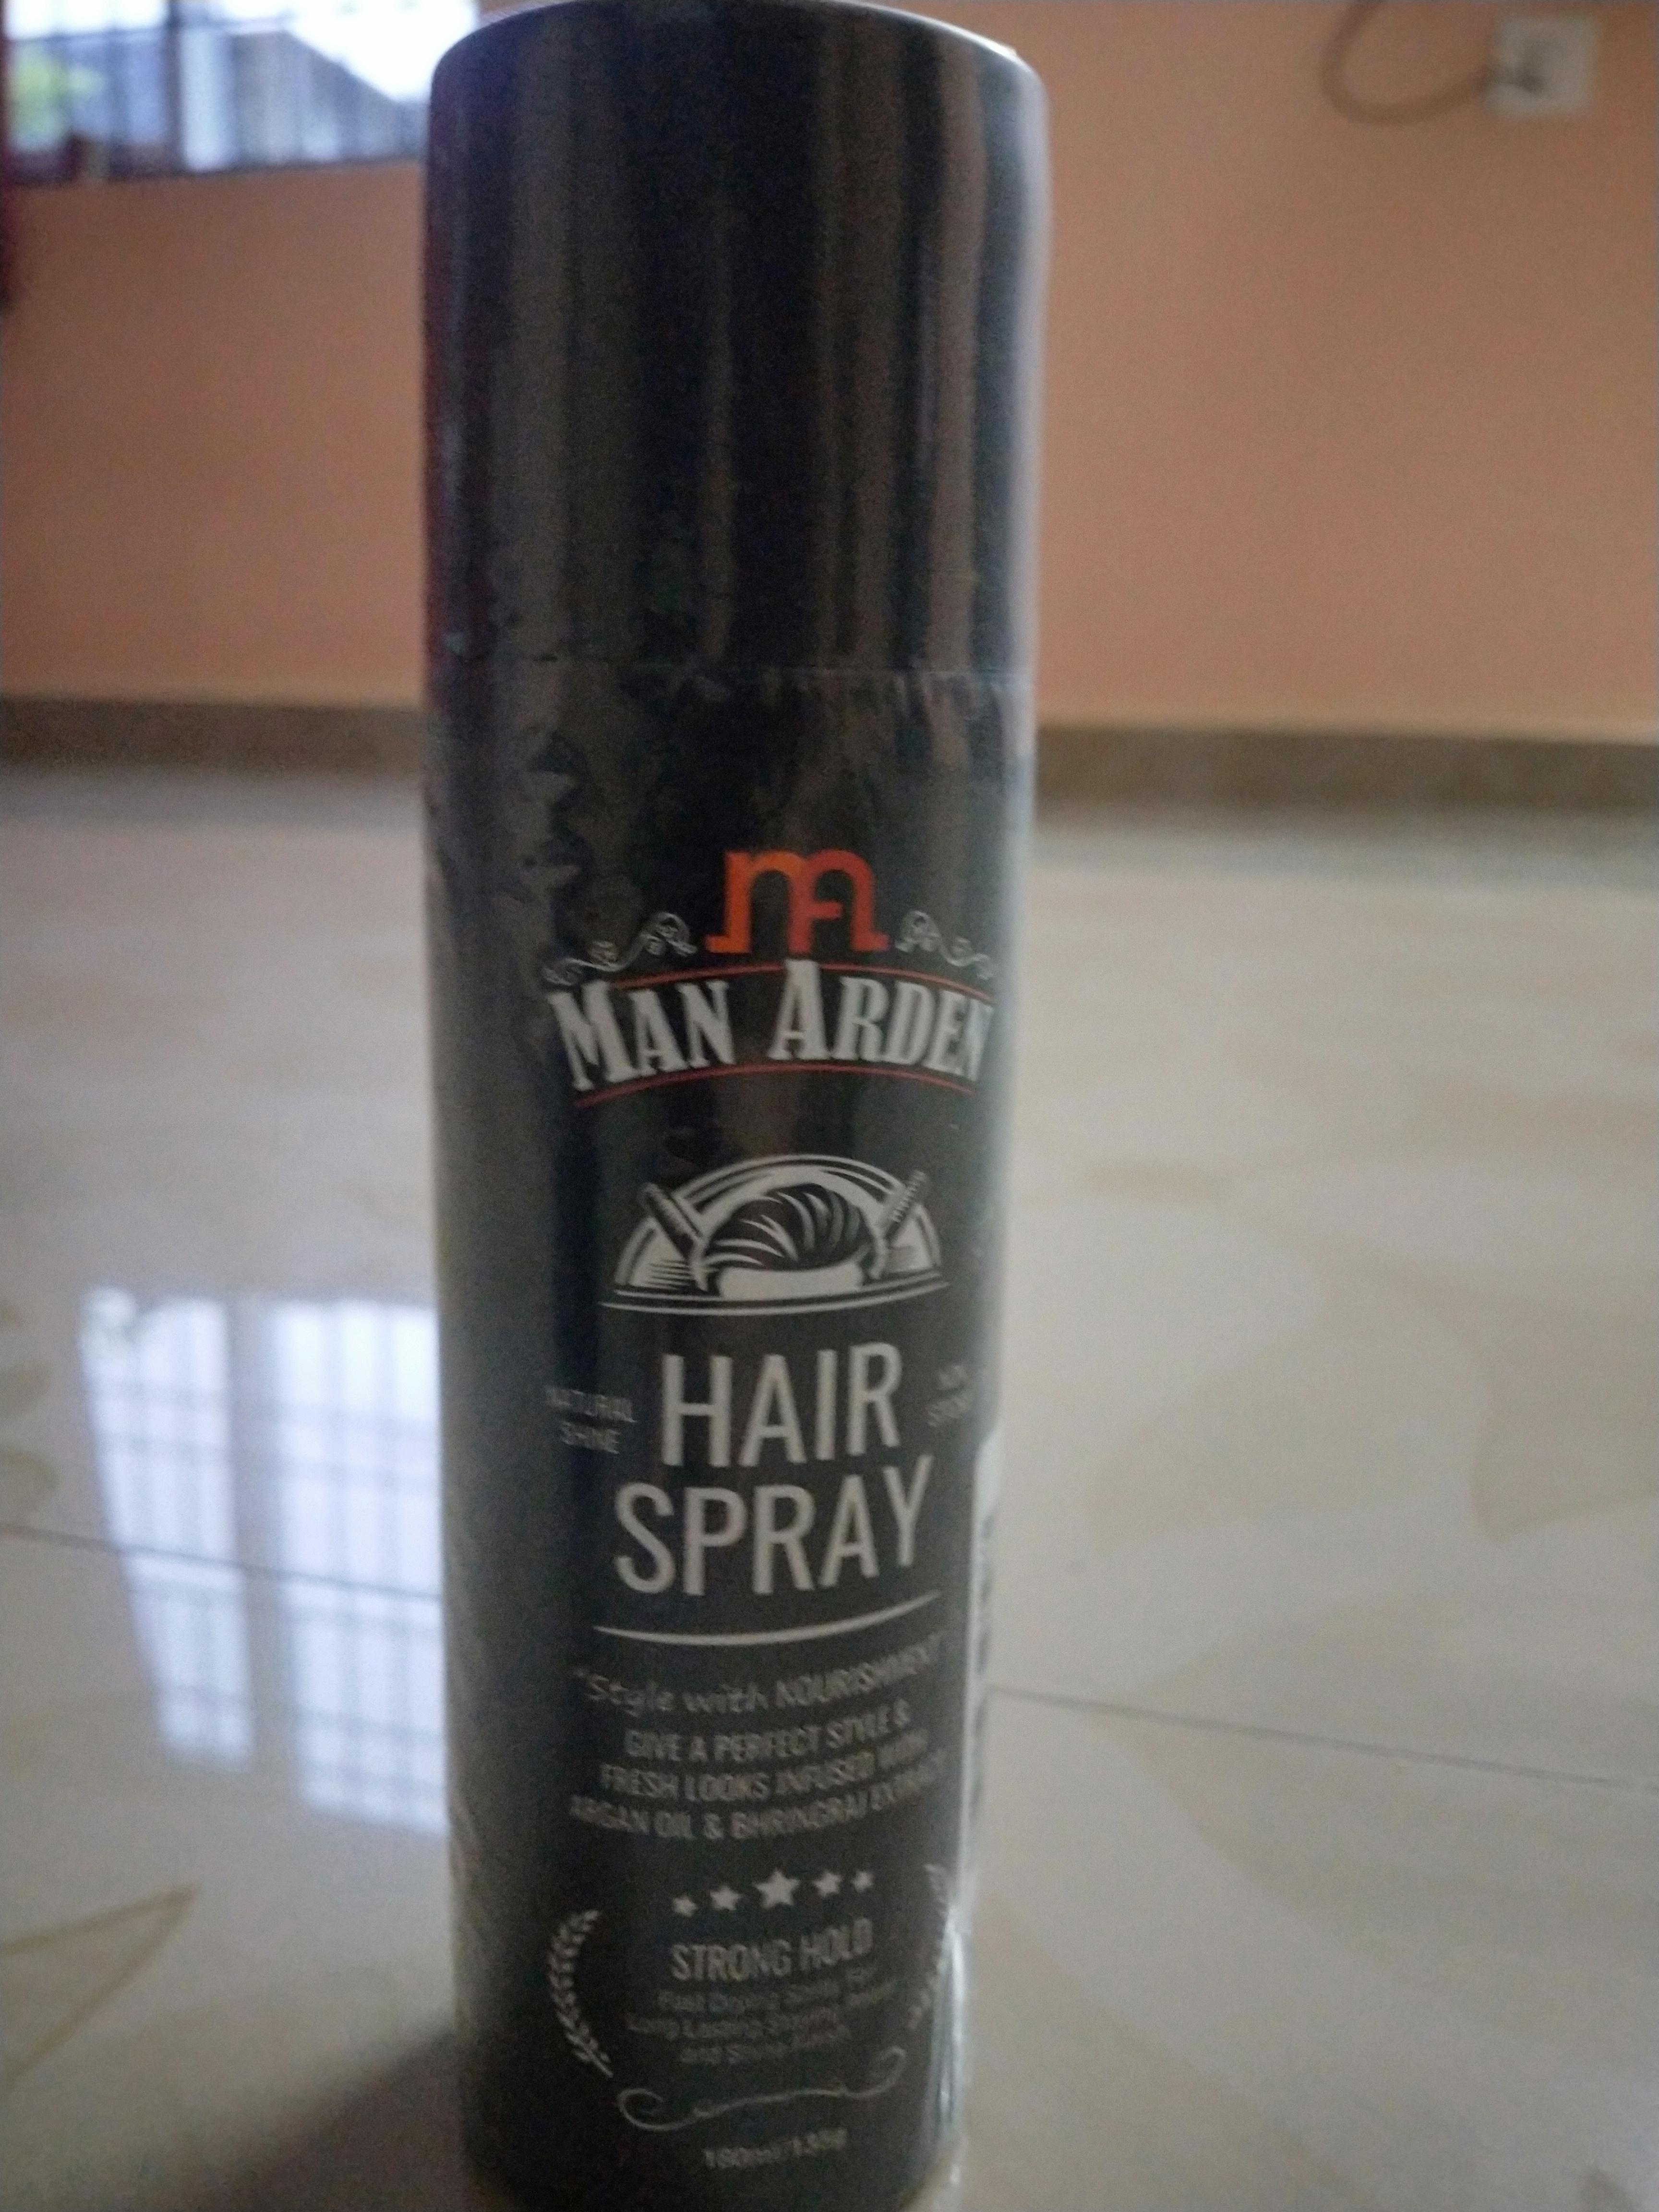 Man Arden Hair Spray-Best hair styling spray-By 9720rakesh